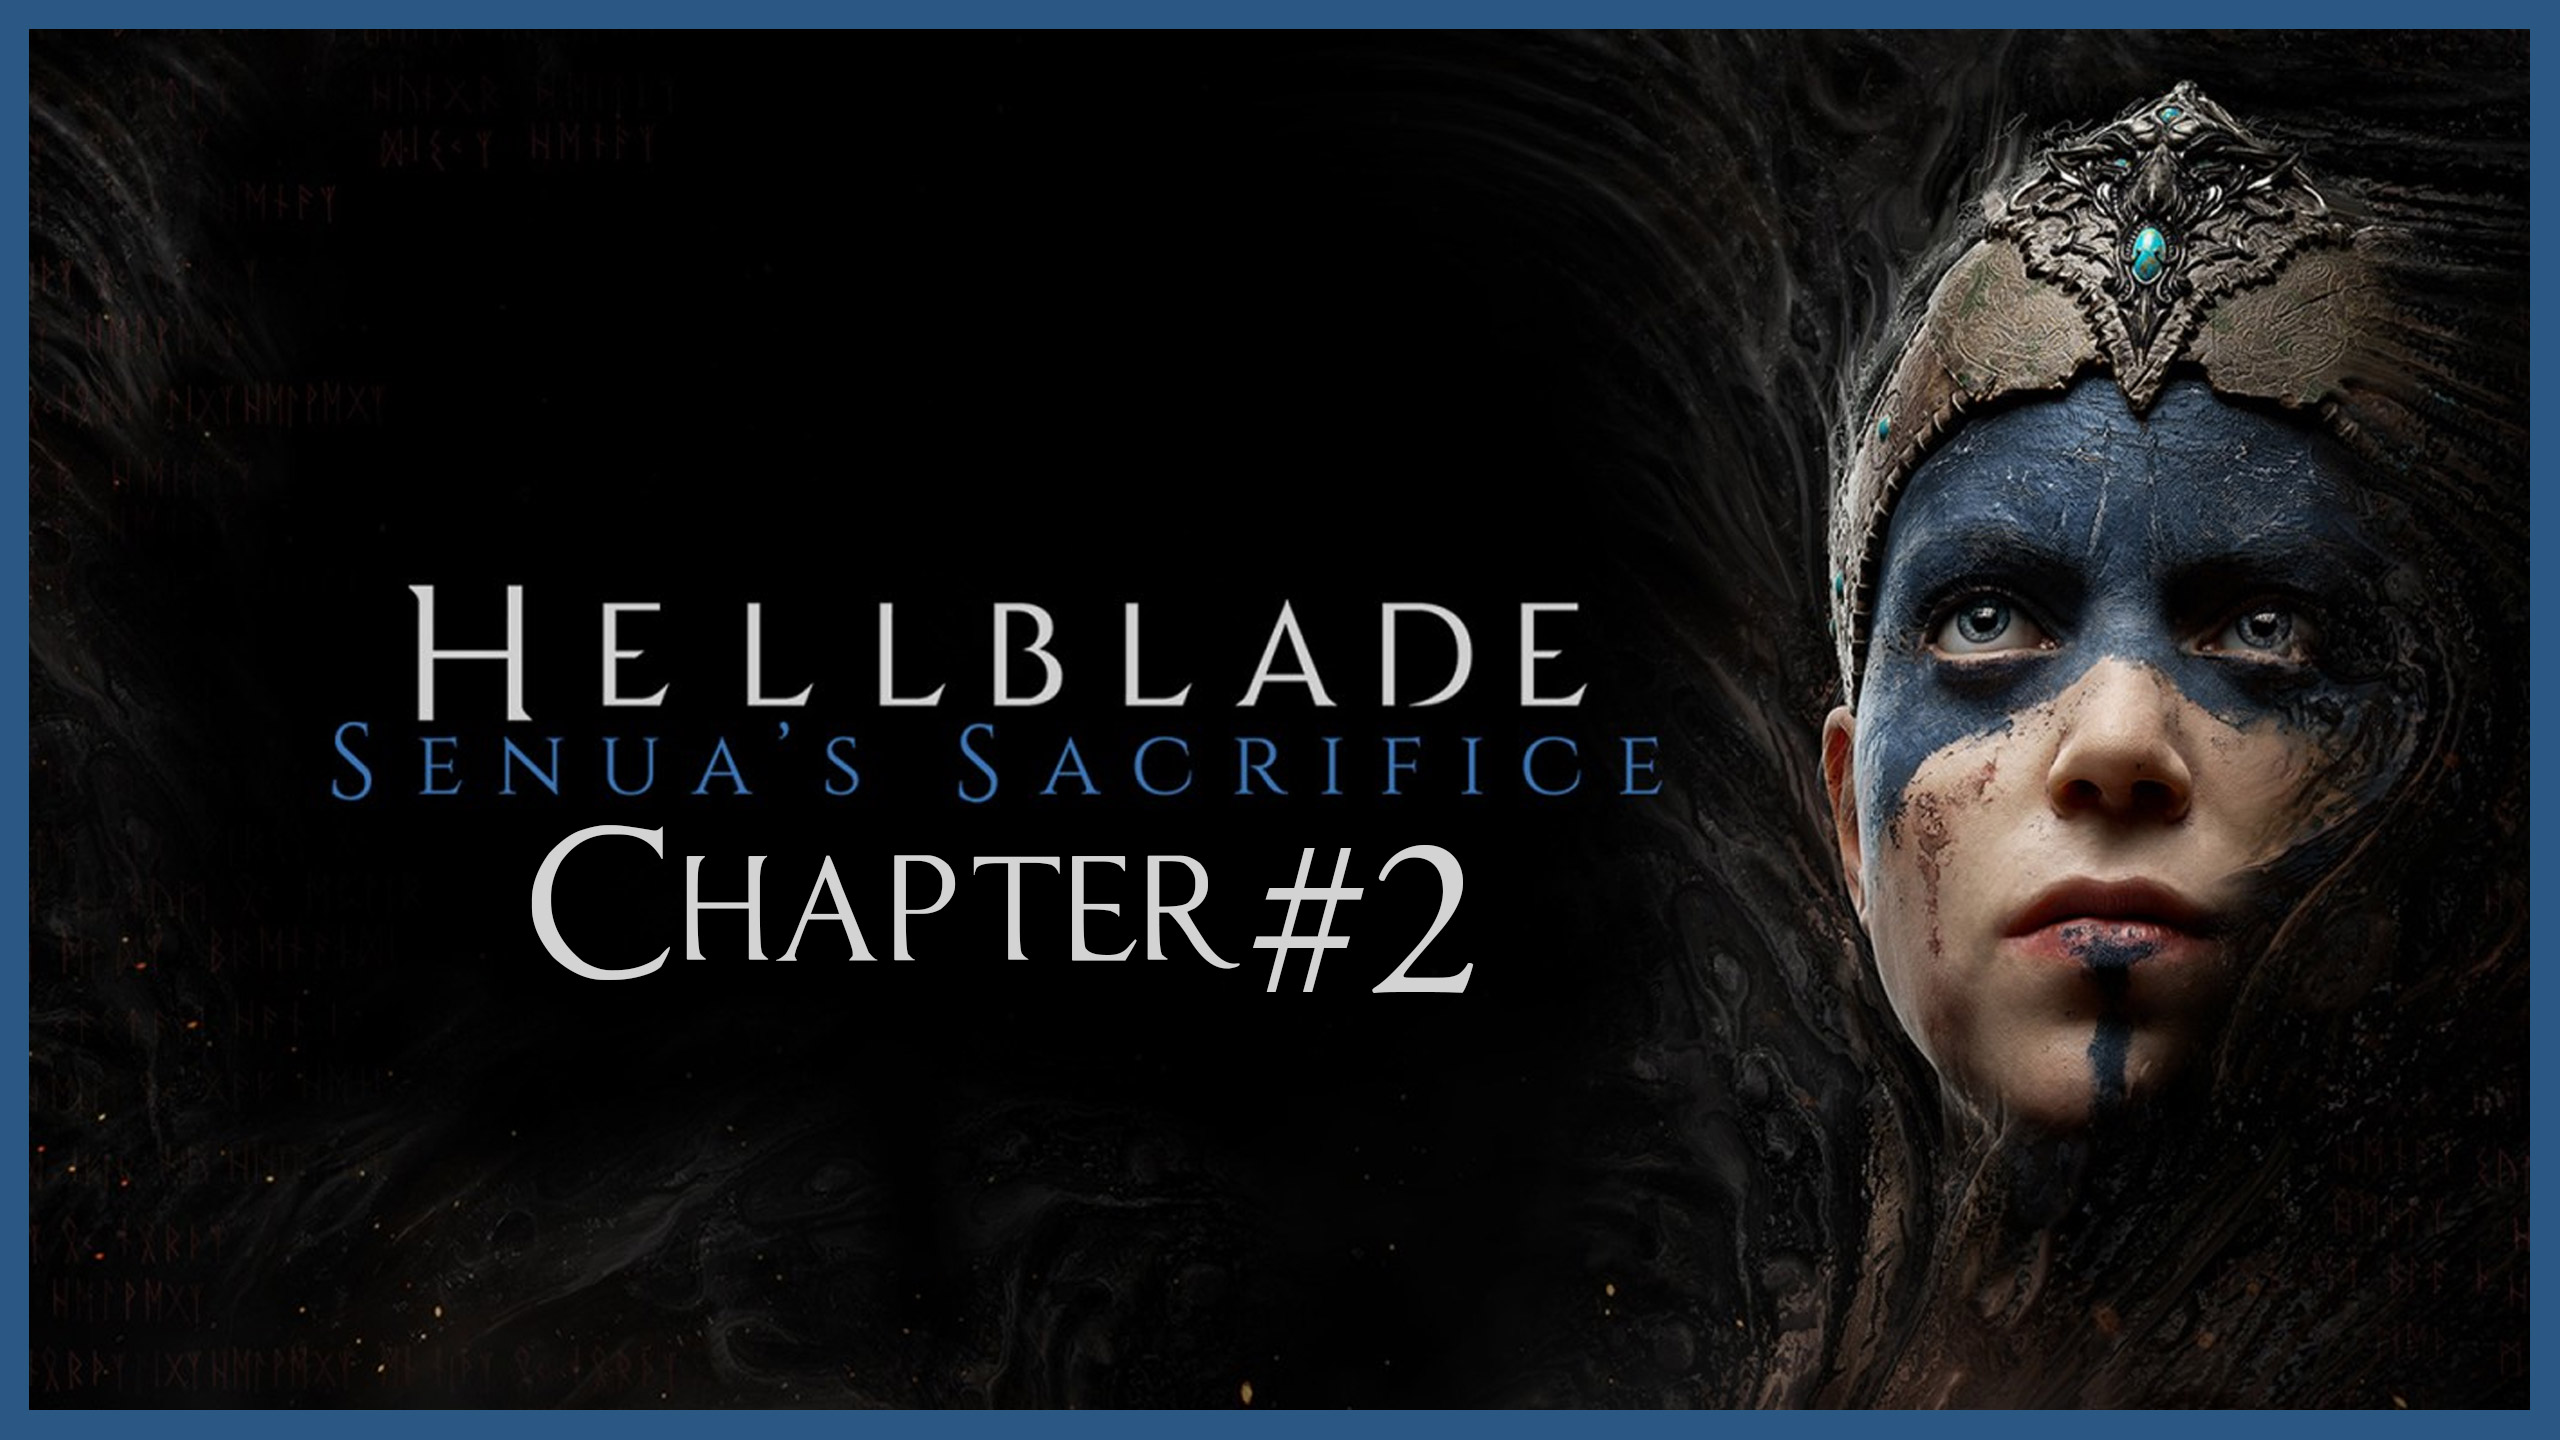 Hellblade Senua's Sacrifice. Все камни знаний. Глава 2